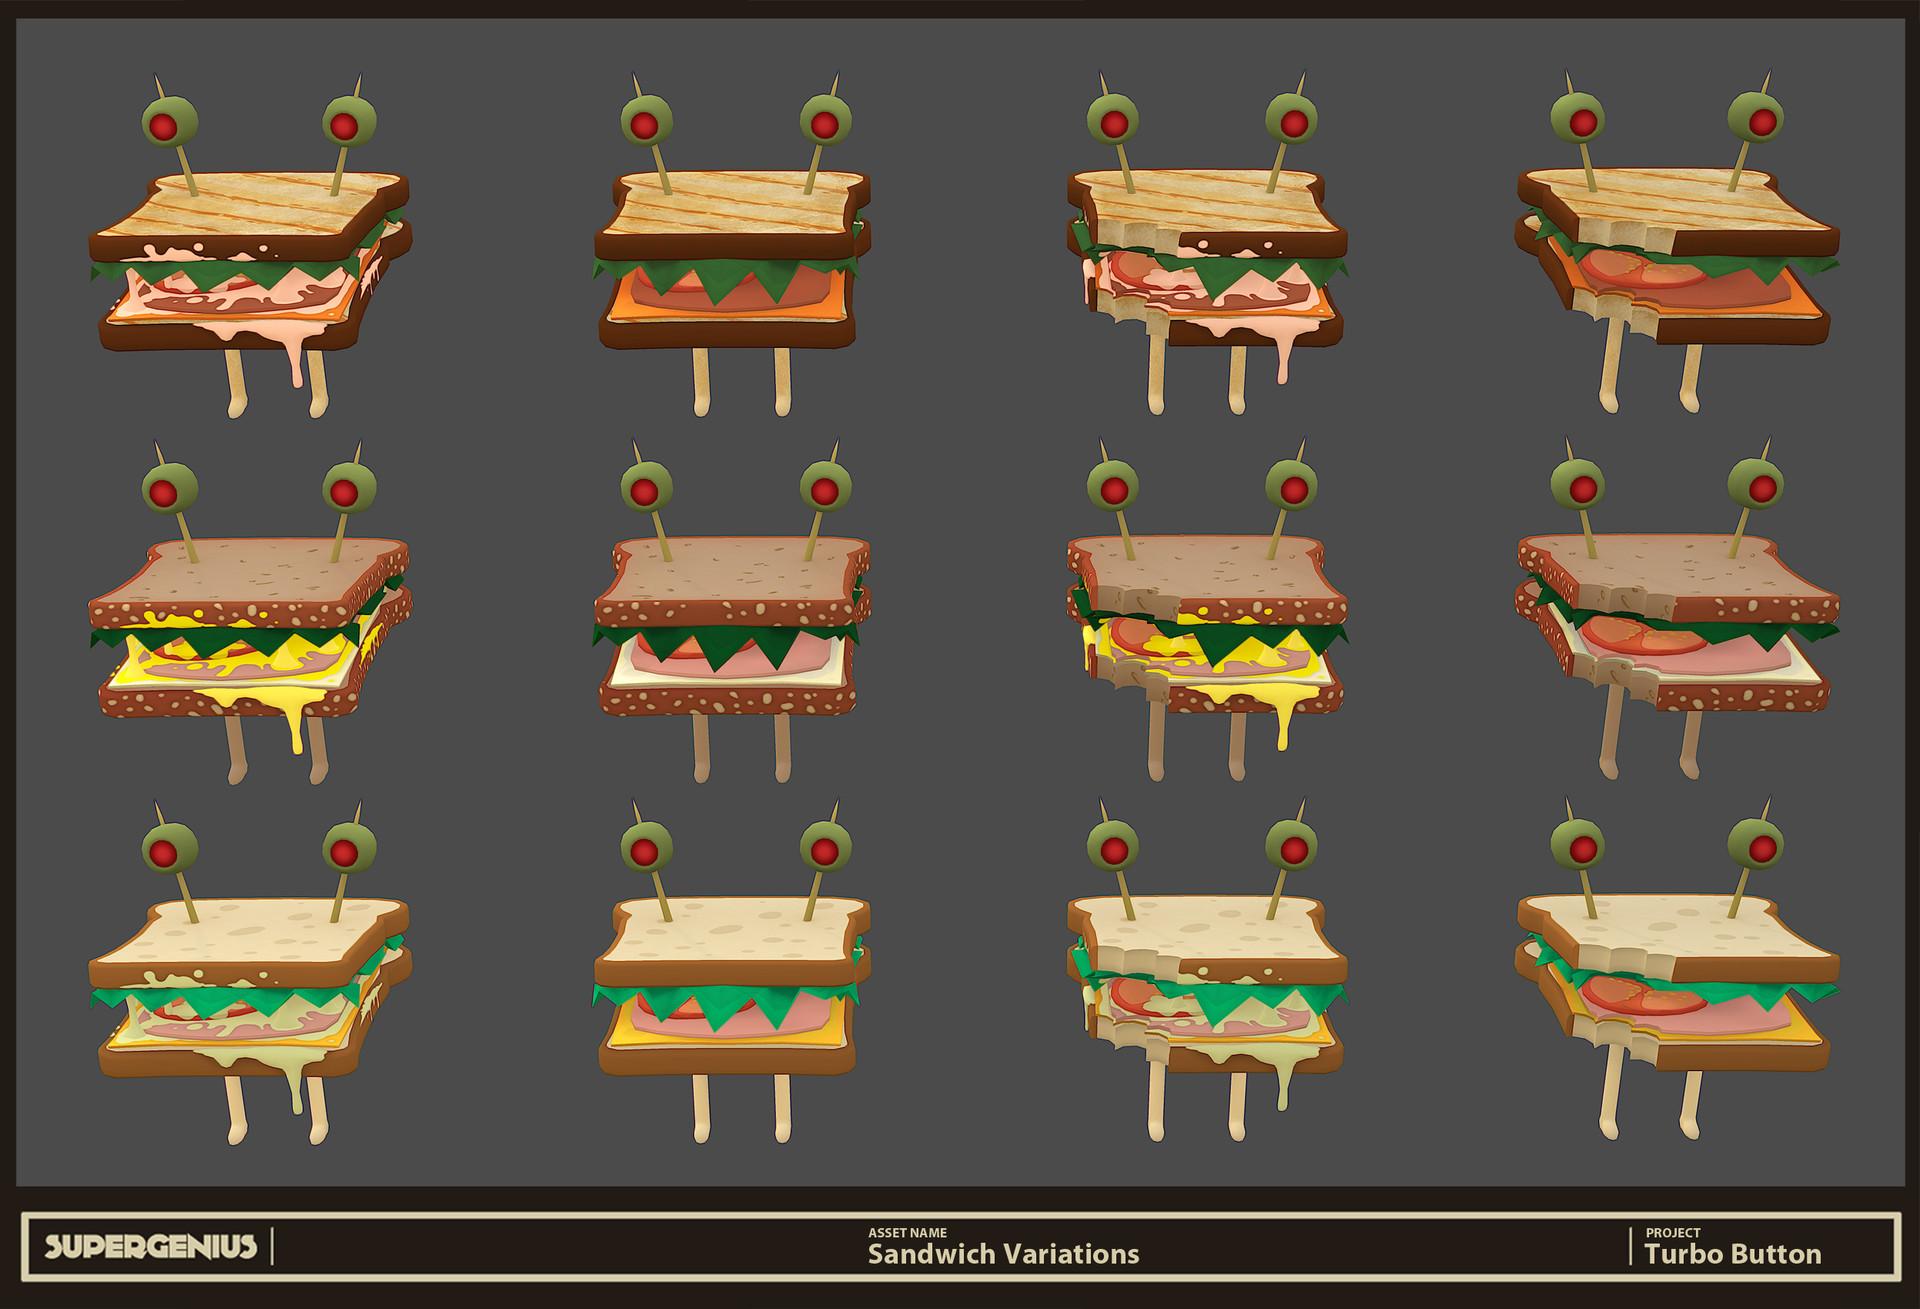 Robert fink tb advtime sandwichvariants 02